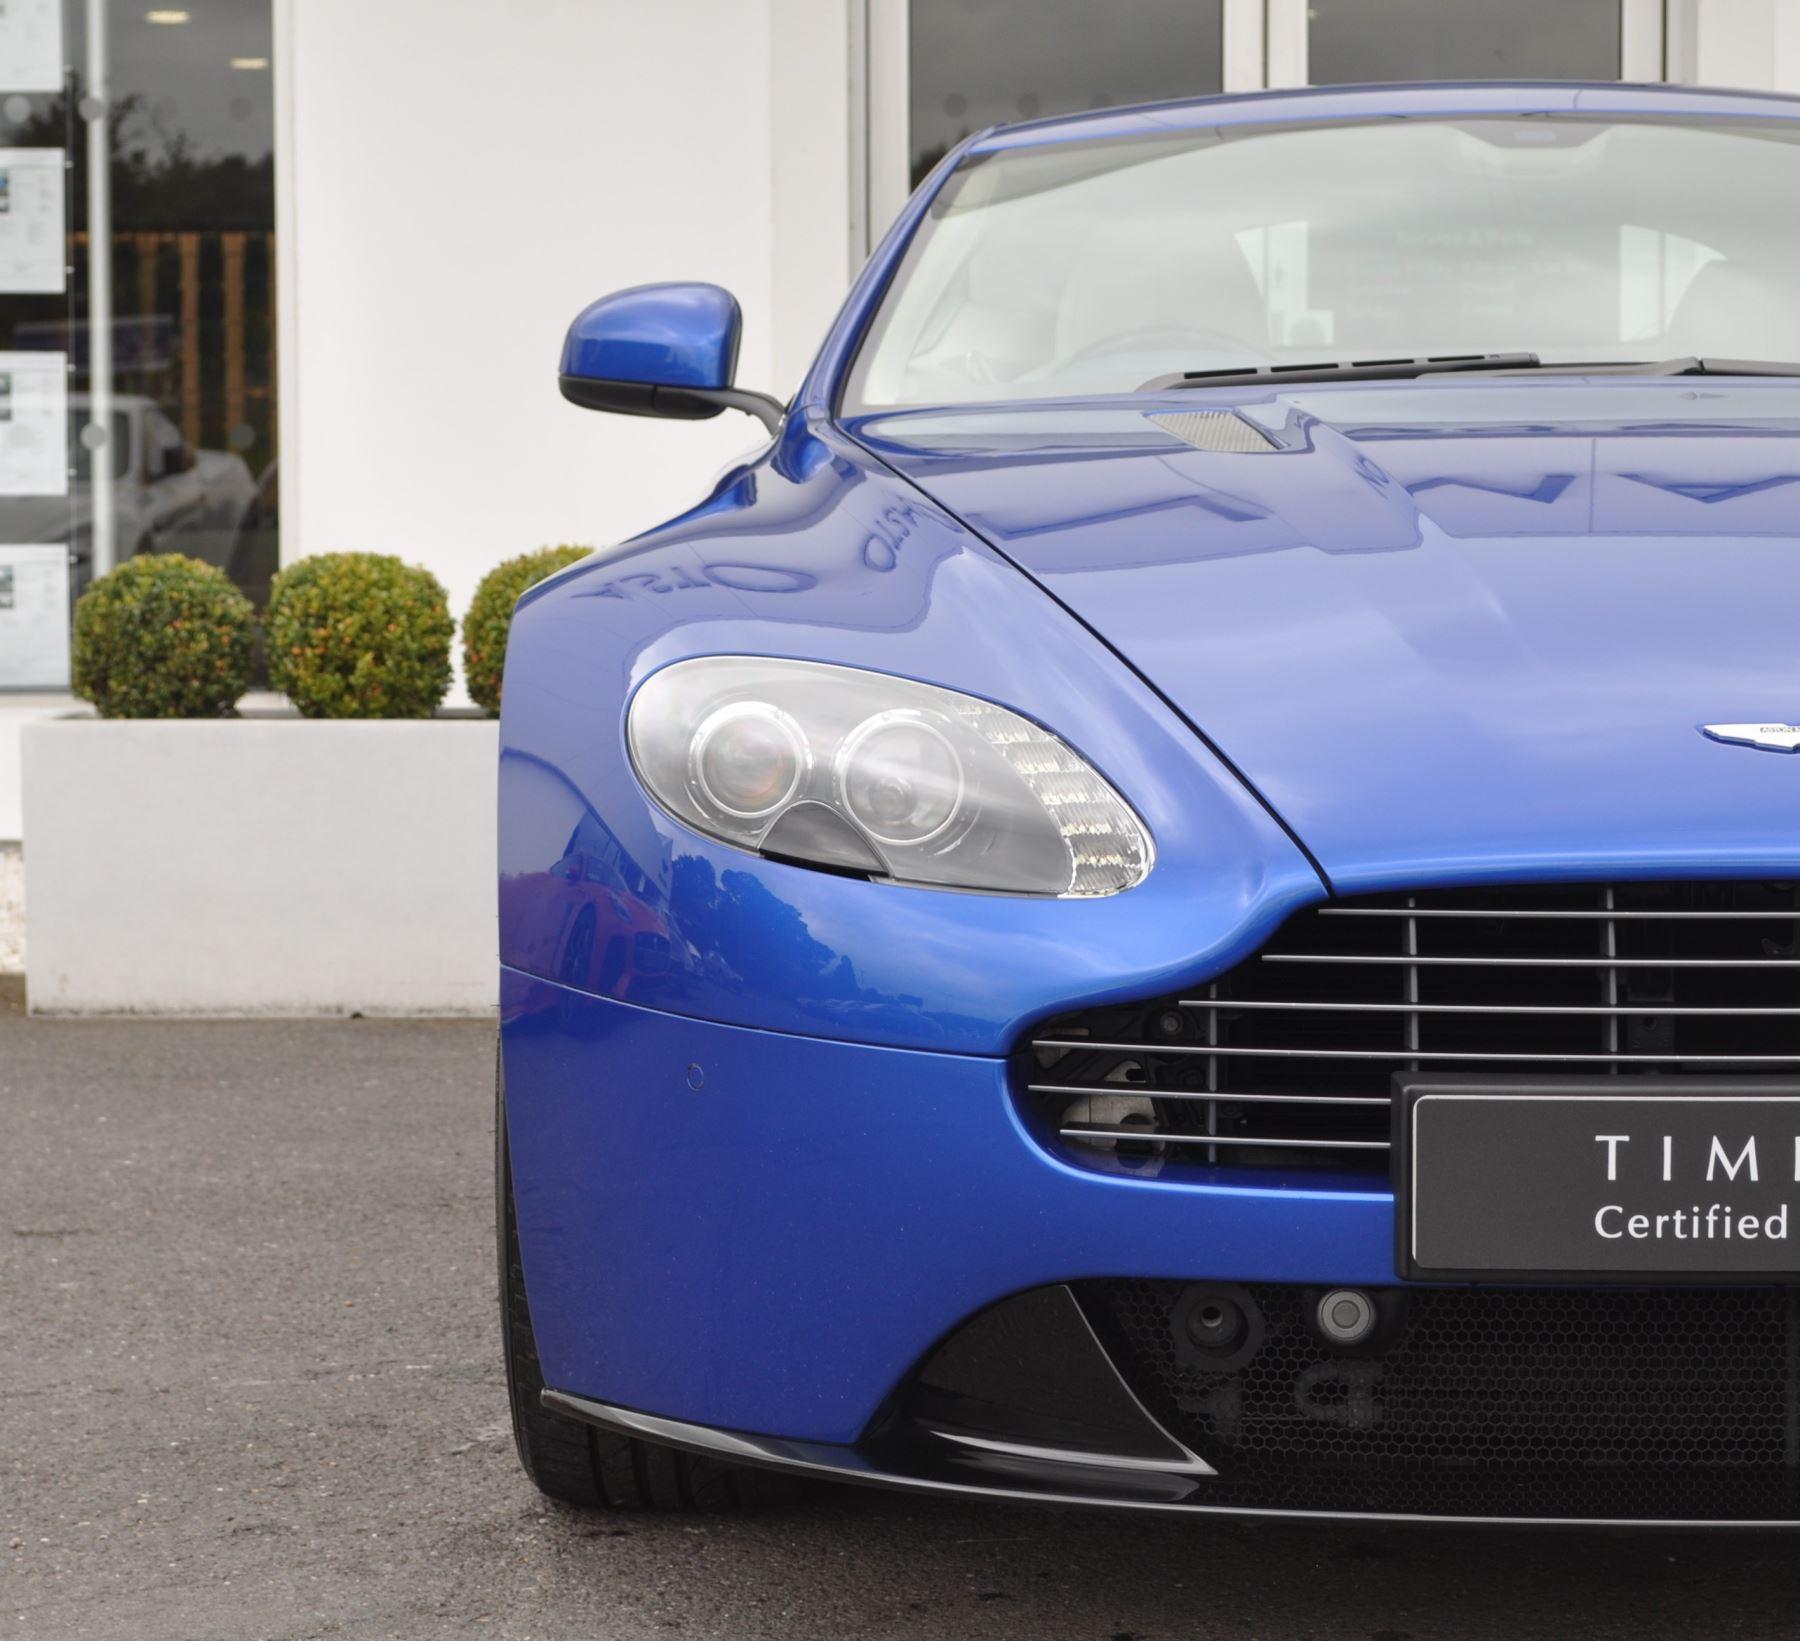 Aston Martin V8 Vantage S Coupe S 2dr Sportshift image 14